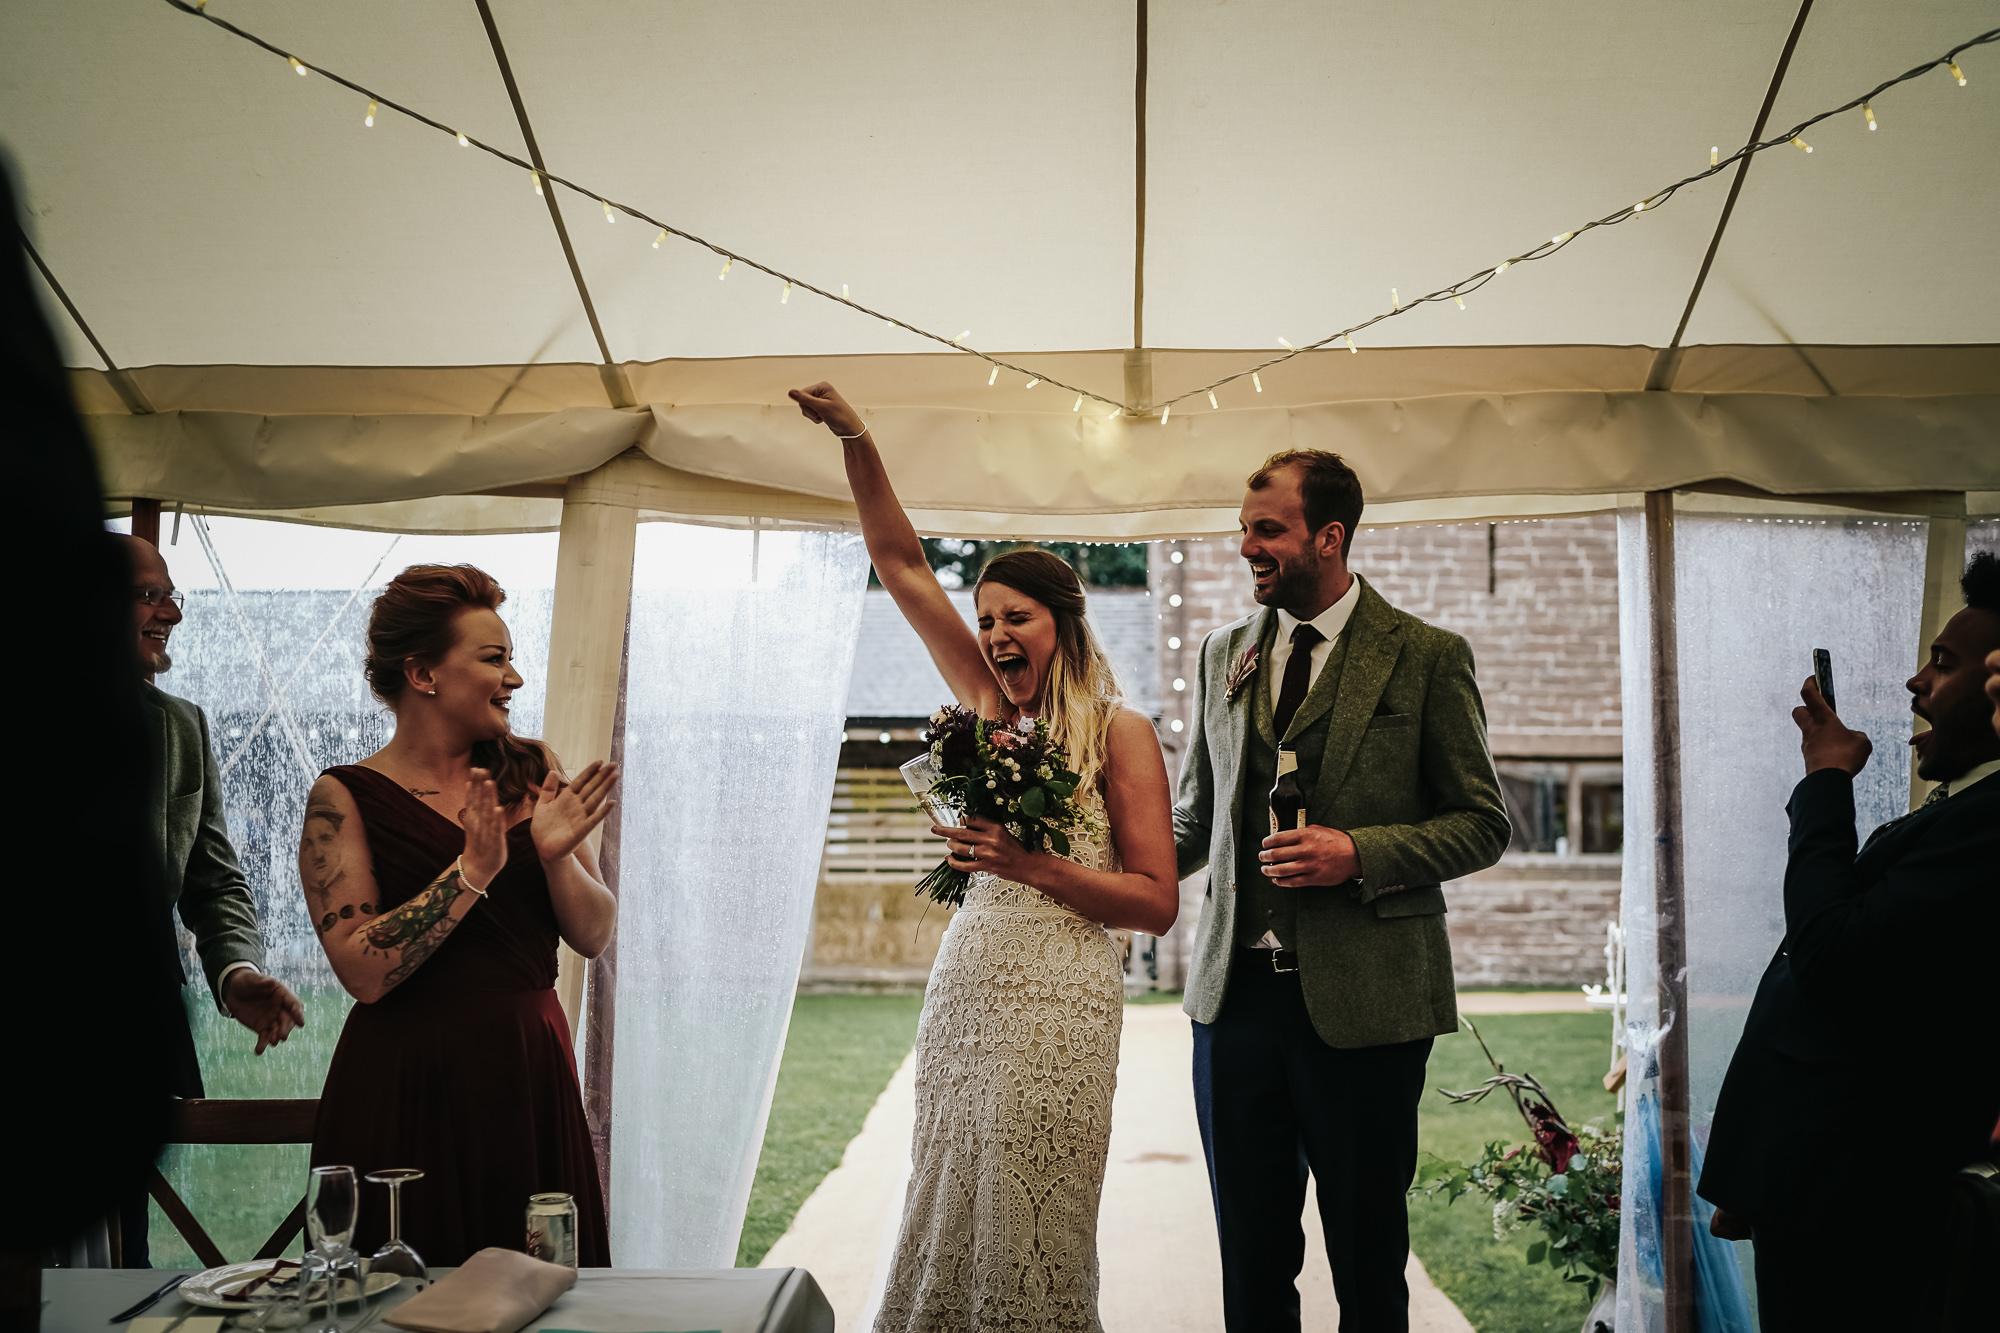 High Barn Wedding photographer lake distect penrith documentry wedding photography (41 of 57).jpg